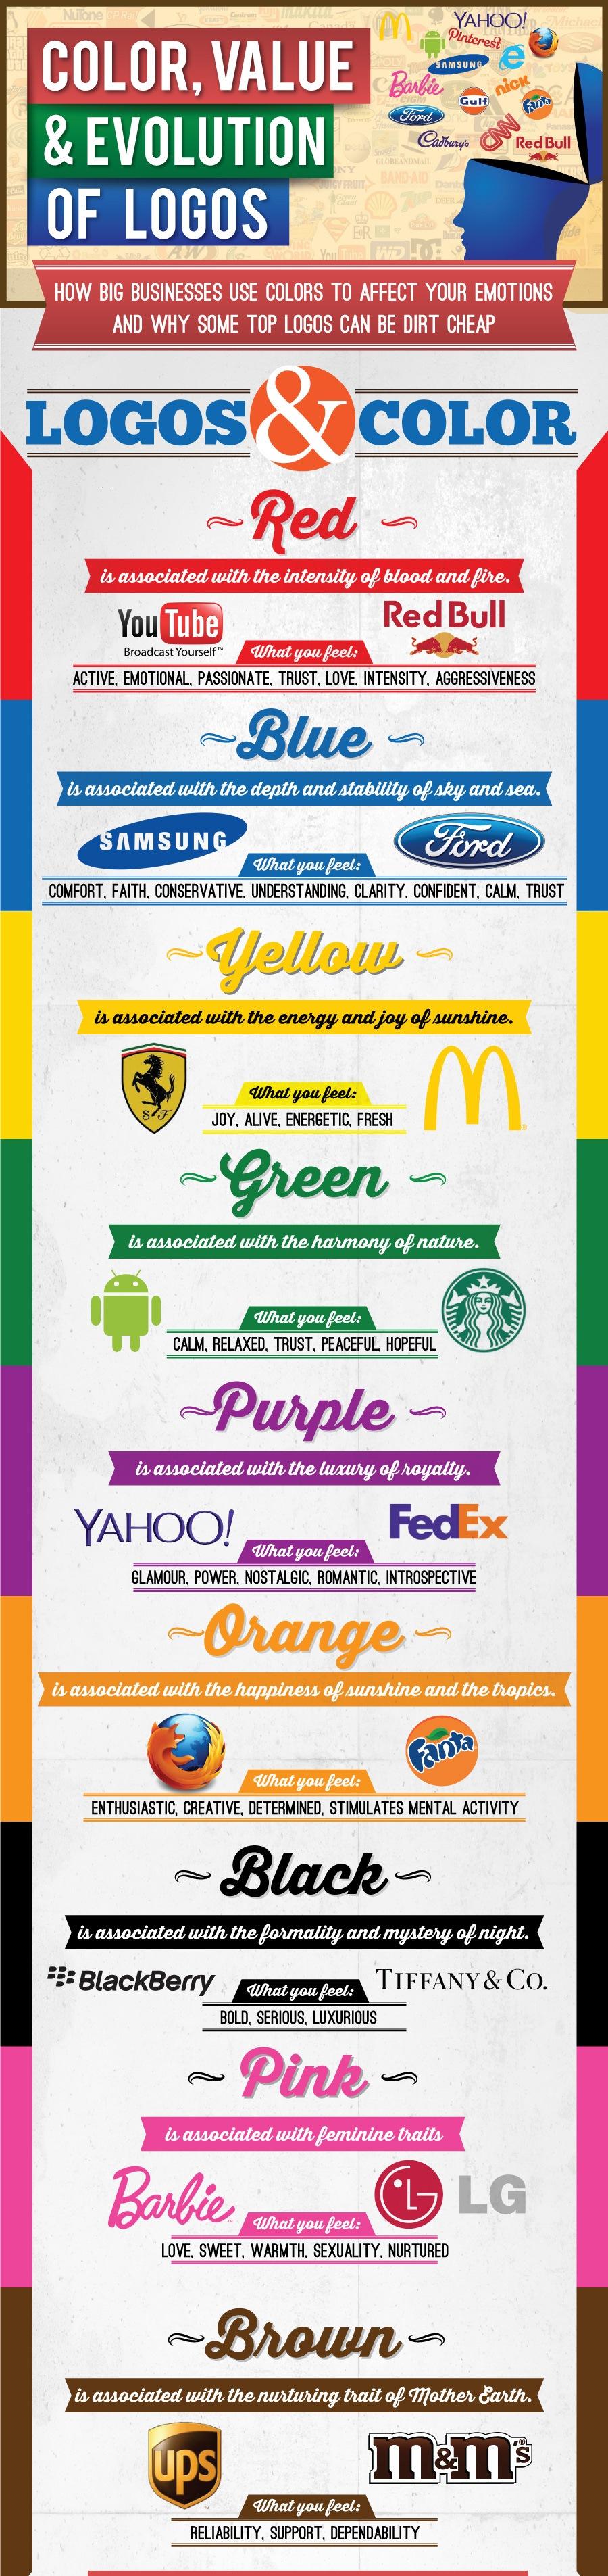 logo-infographic_edited